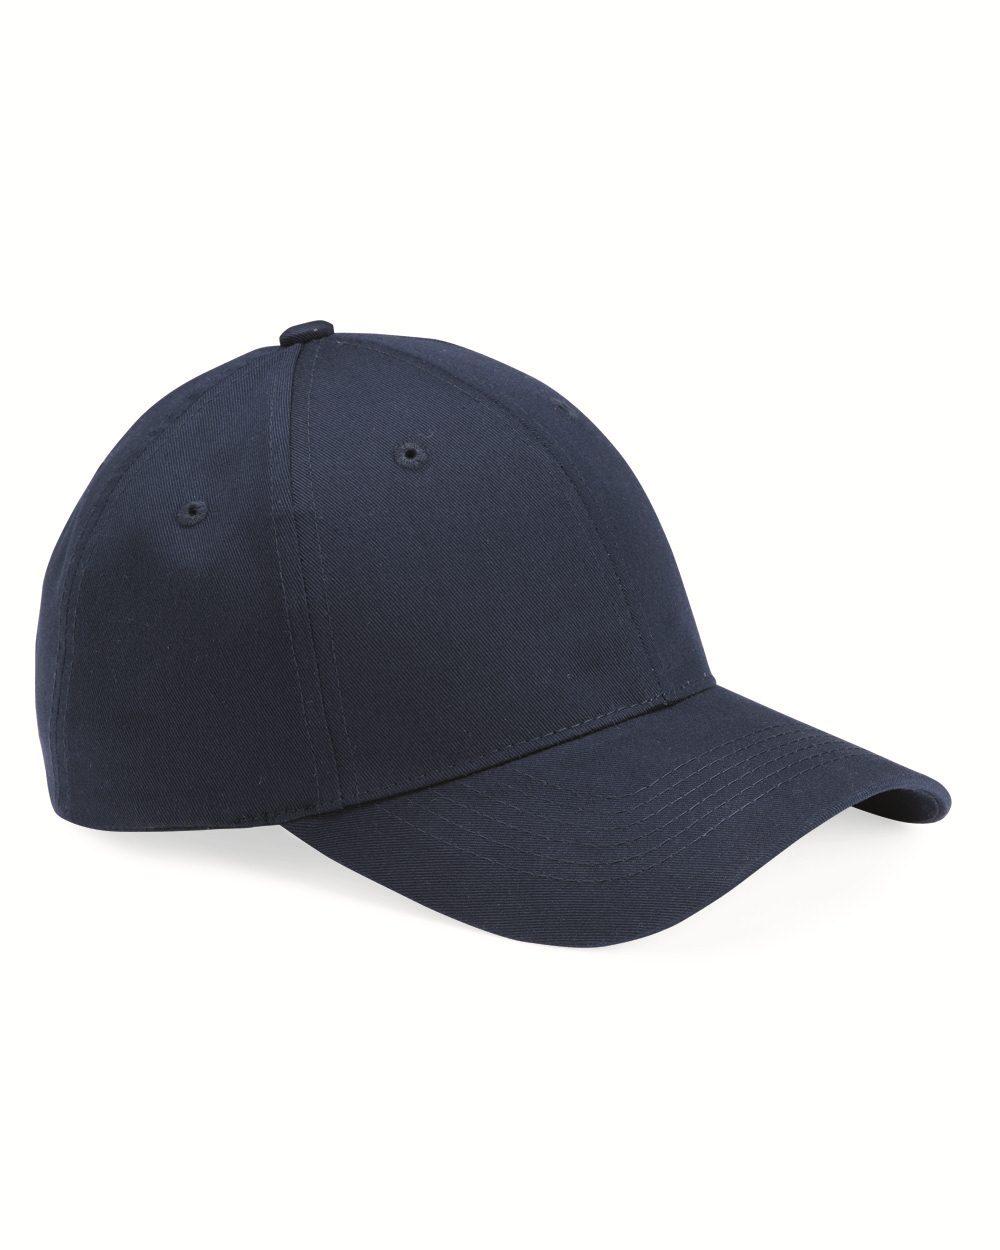 Sportsman Cap 2260 Twill Cap with Velcro Closure